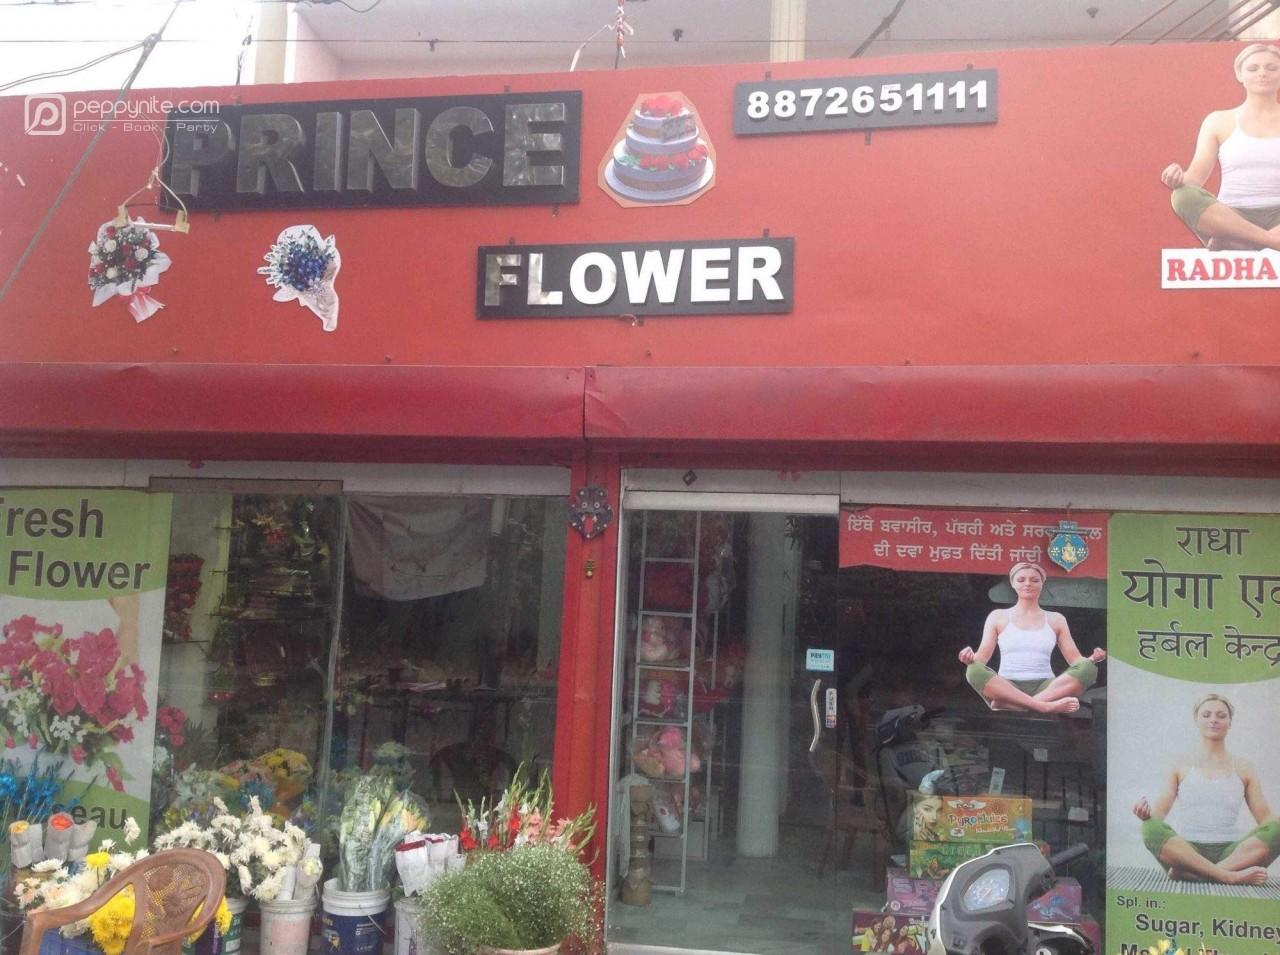 Prince Flowers